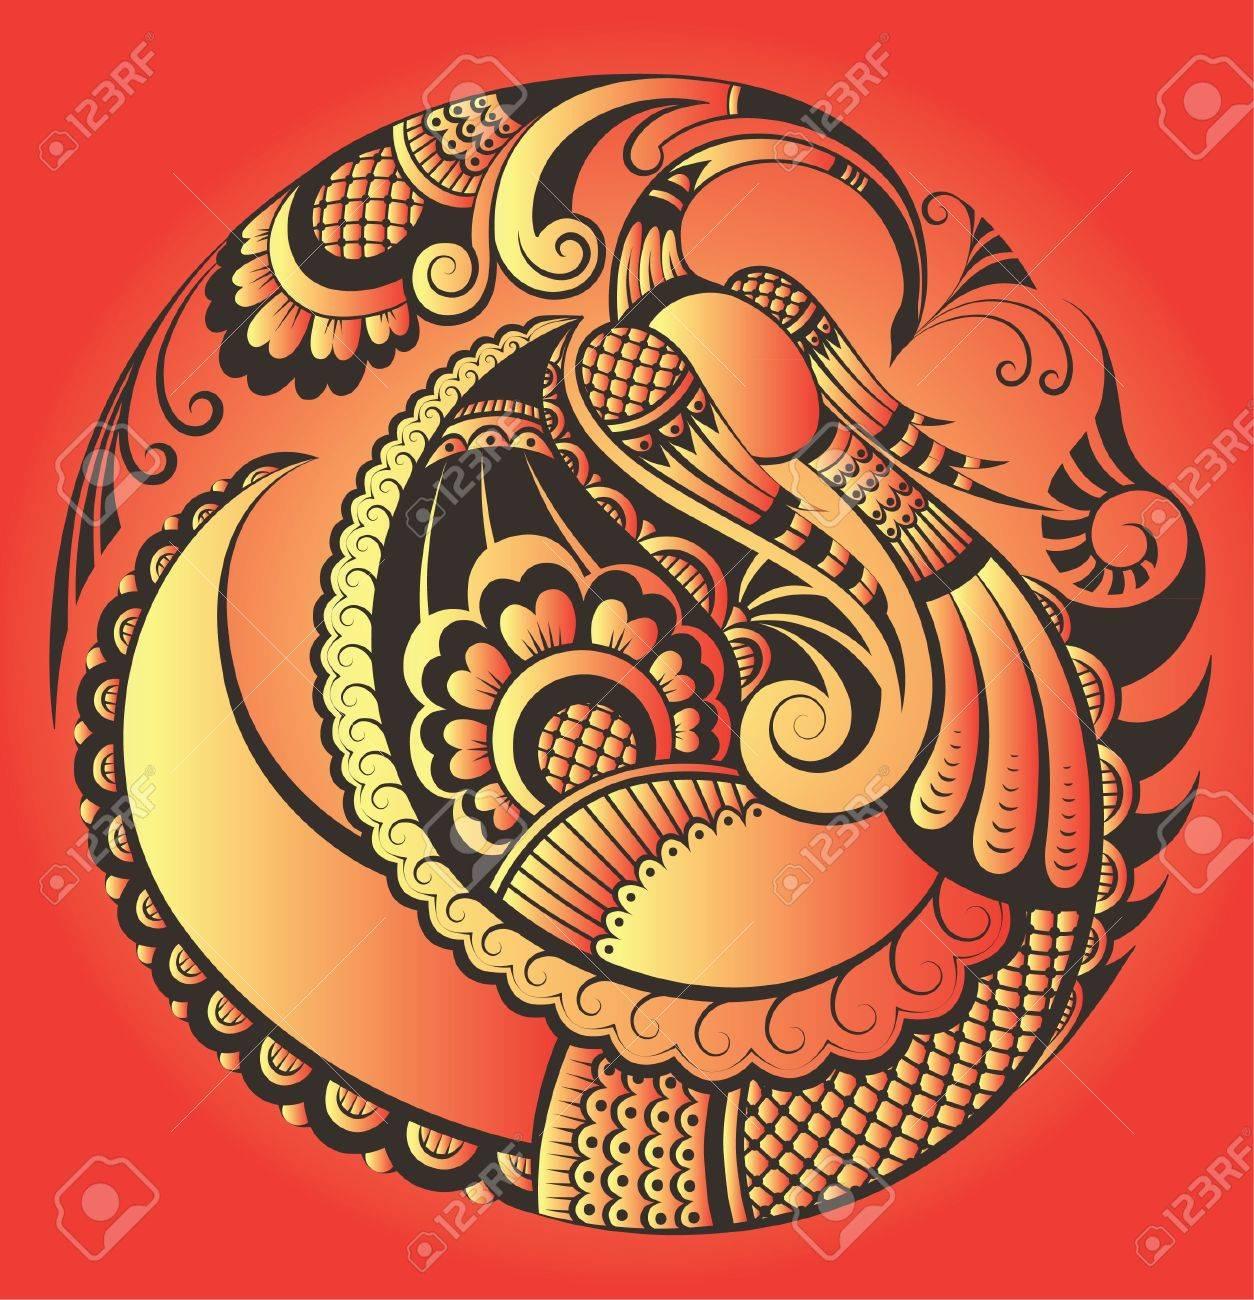 Abstract phoenix bird in paisley style - 12492228